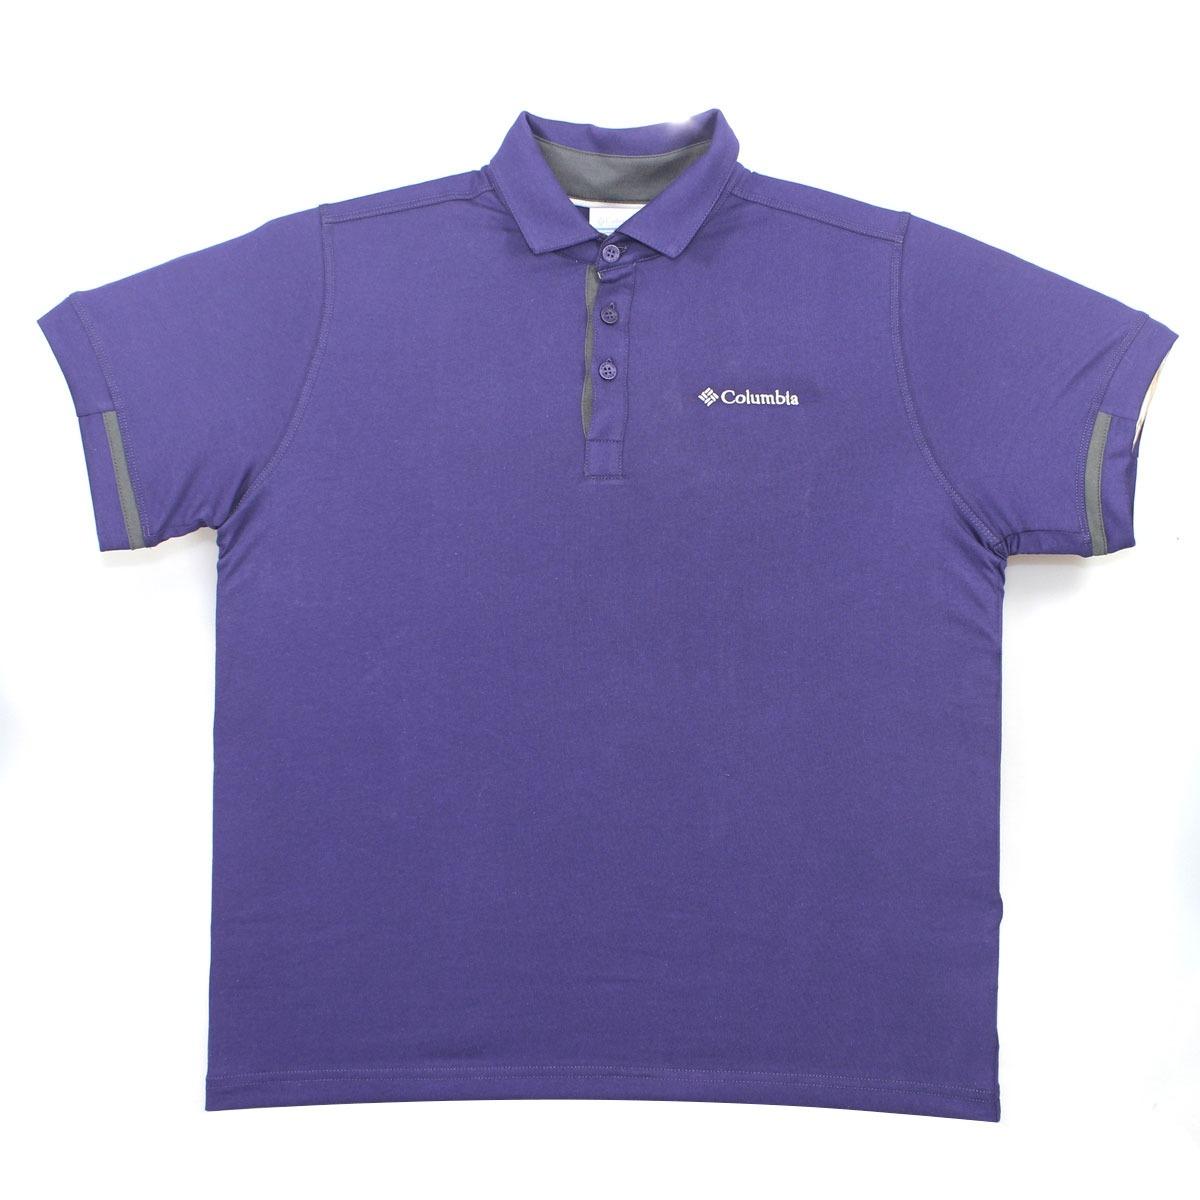 camisa polo columbia pool violet blue 320270. Carregando zoom. 87d6867085b4f